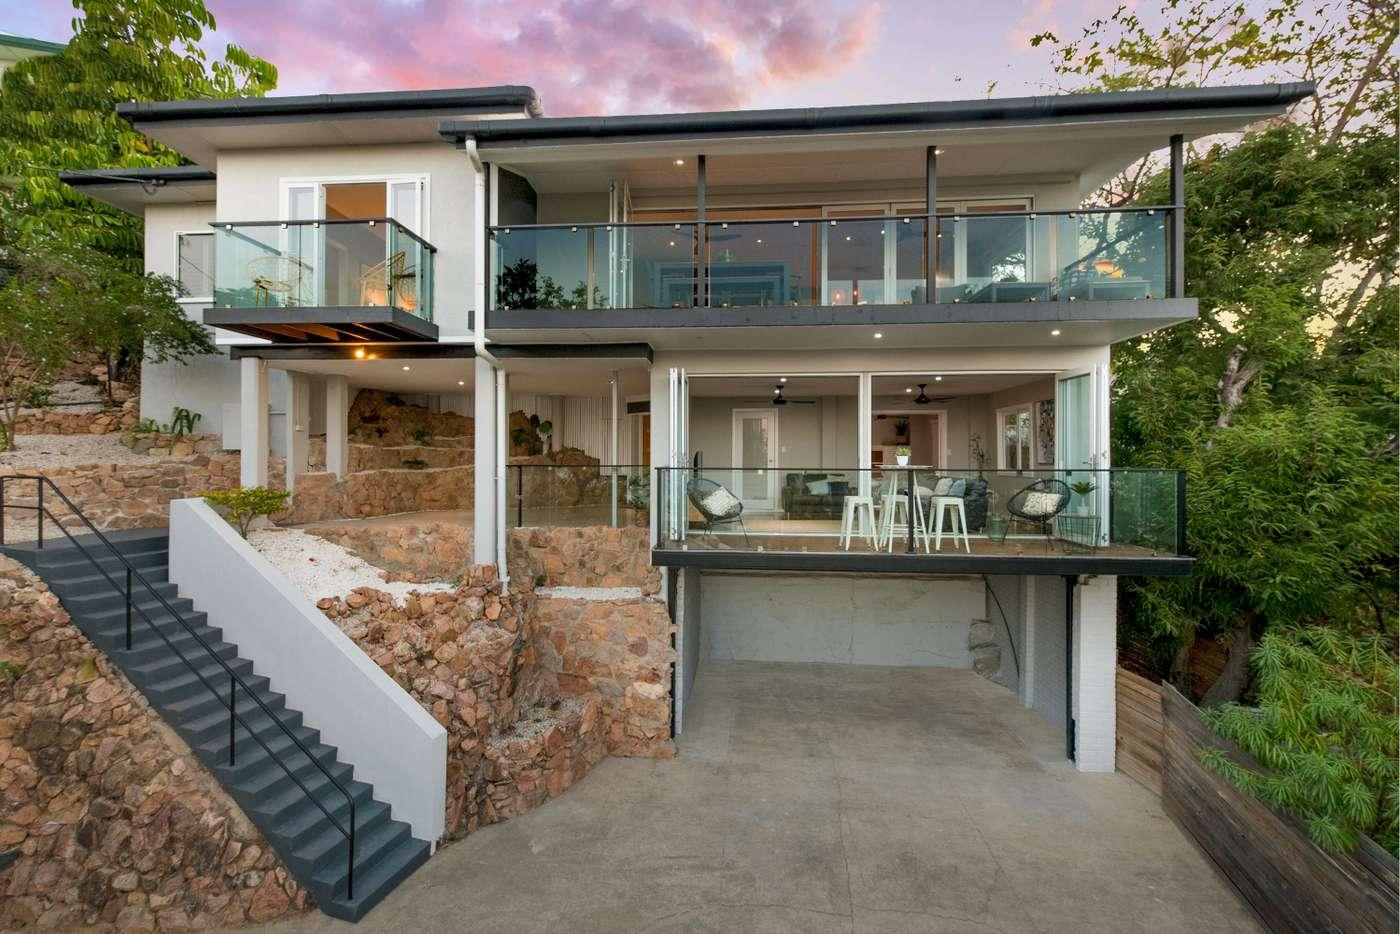 Main view of Homely house listing, 200 Denham Street, North Ward QLD 4810